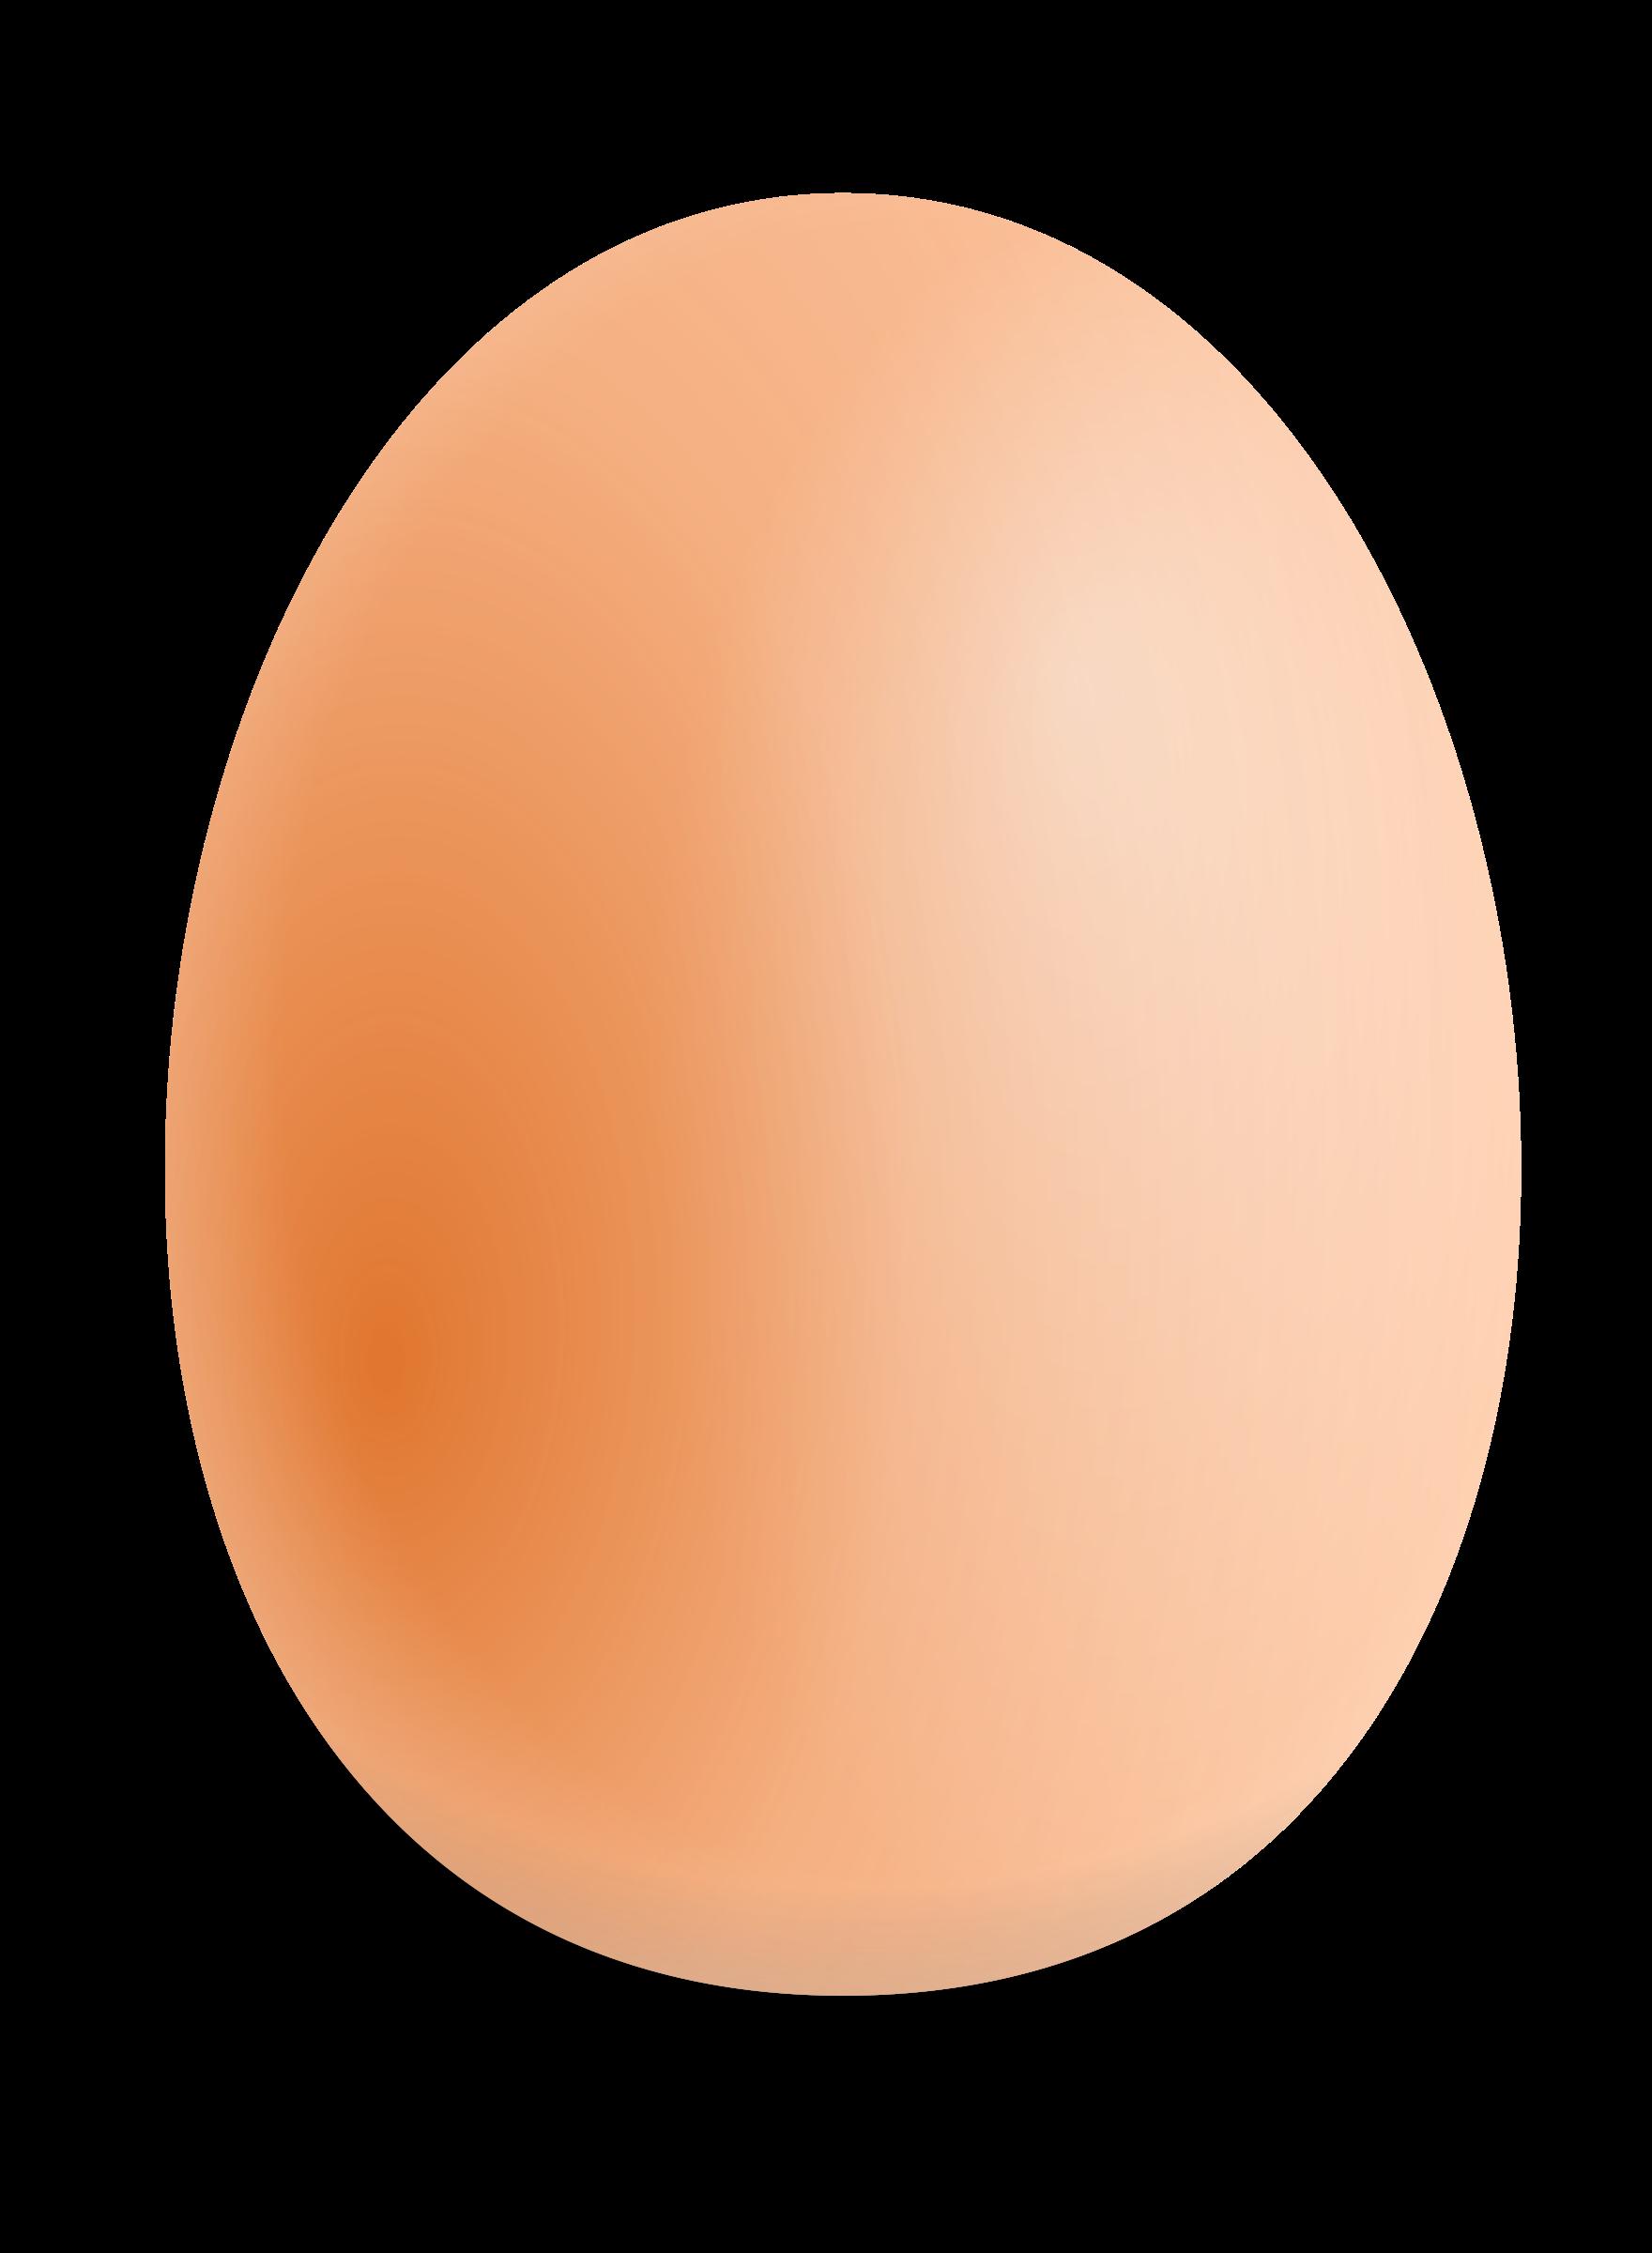 Eggs clipart bird egg. One isolated stock photo